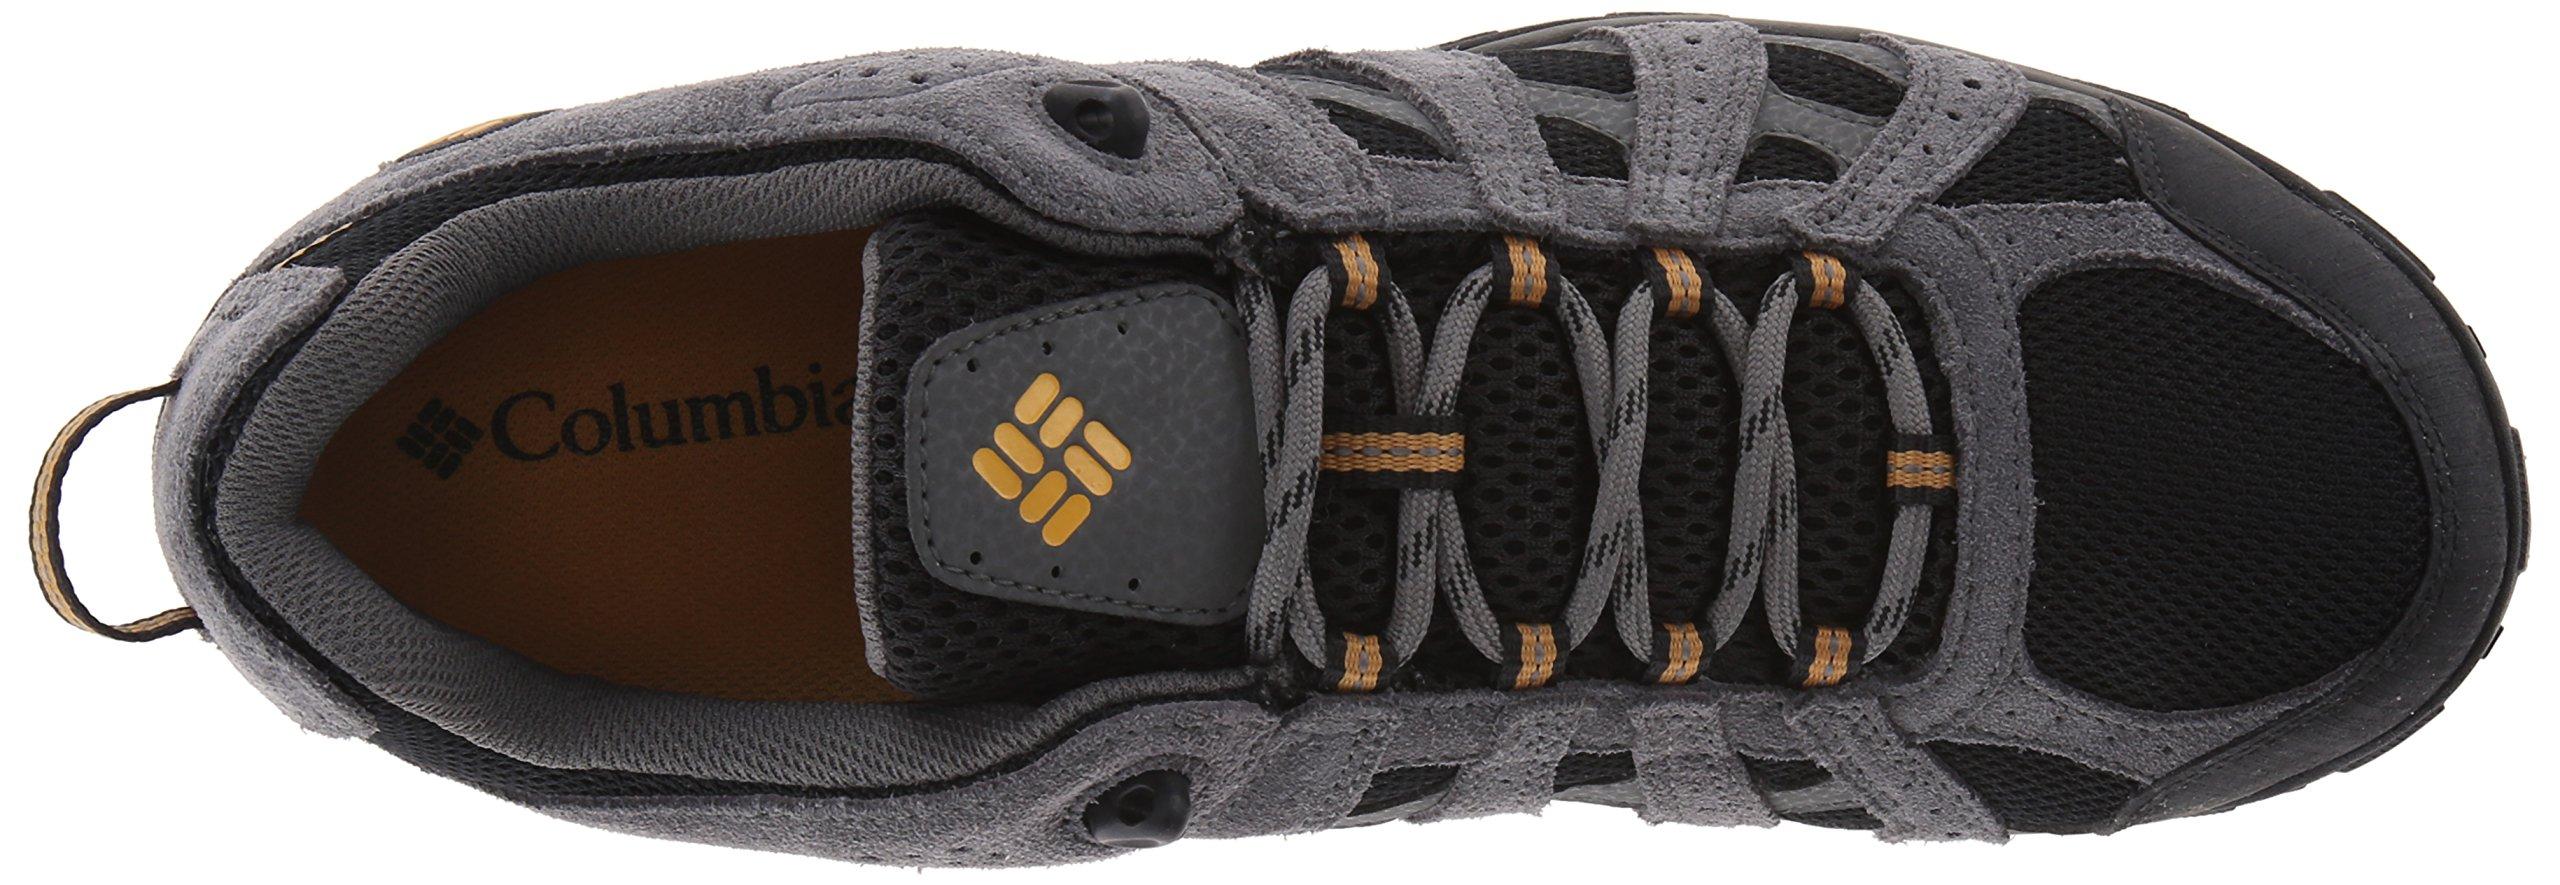 Columbia Men's Redmond Waterproof Hiking Shoe Black, Squash 7.5 D US by Columbia (Image #8)